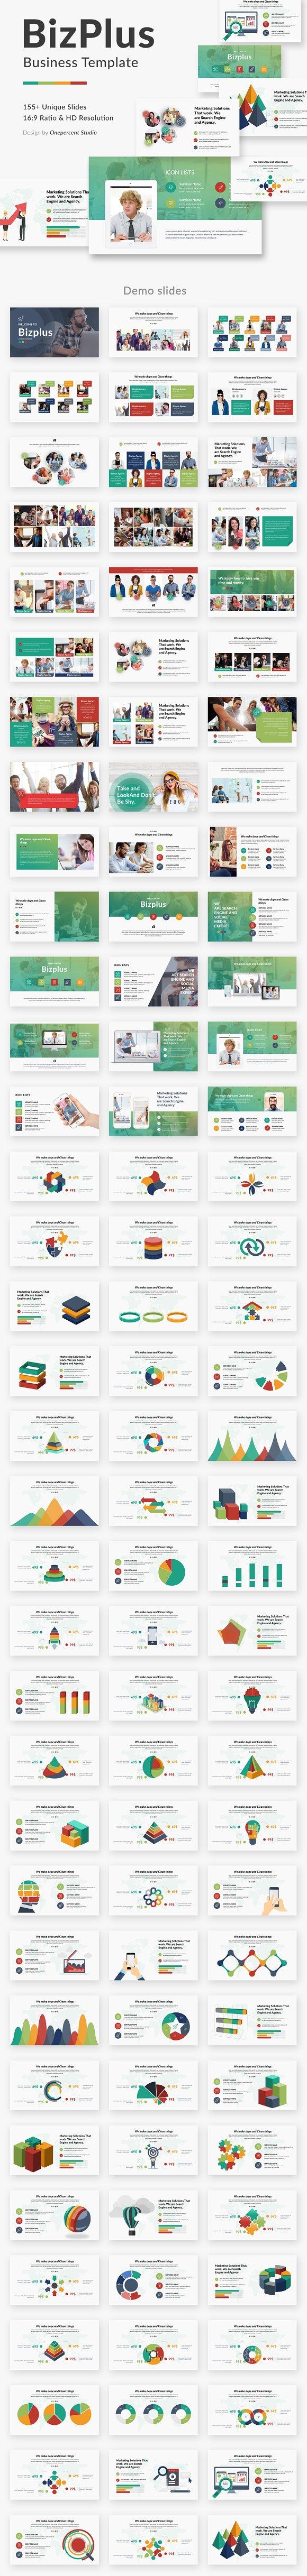 BizPlus Multipurpose Powerpoint